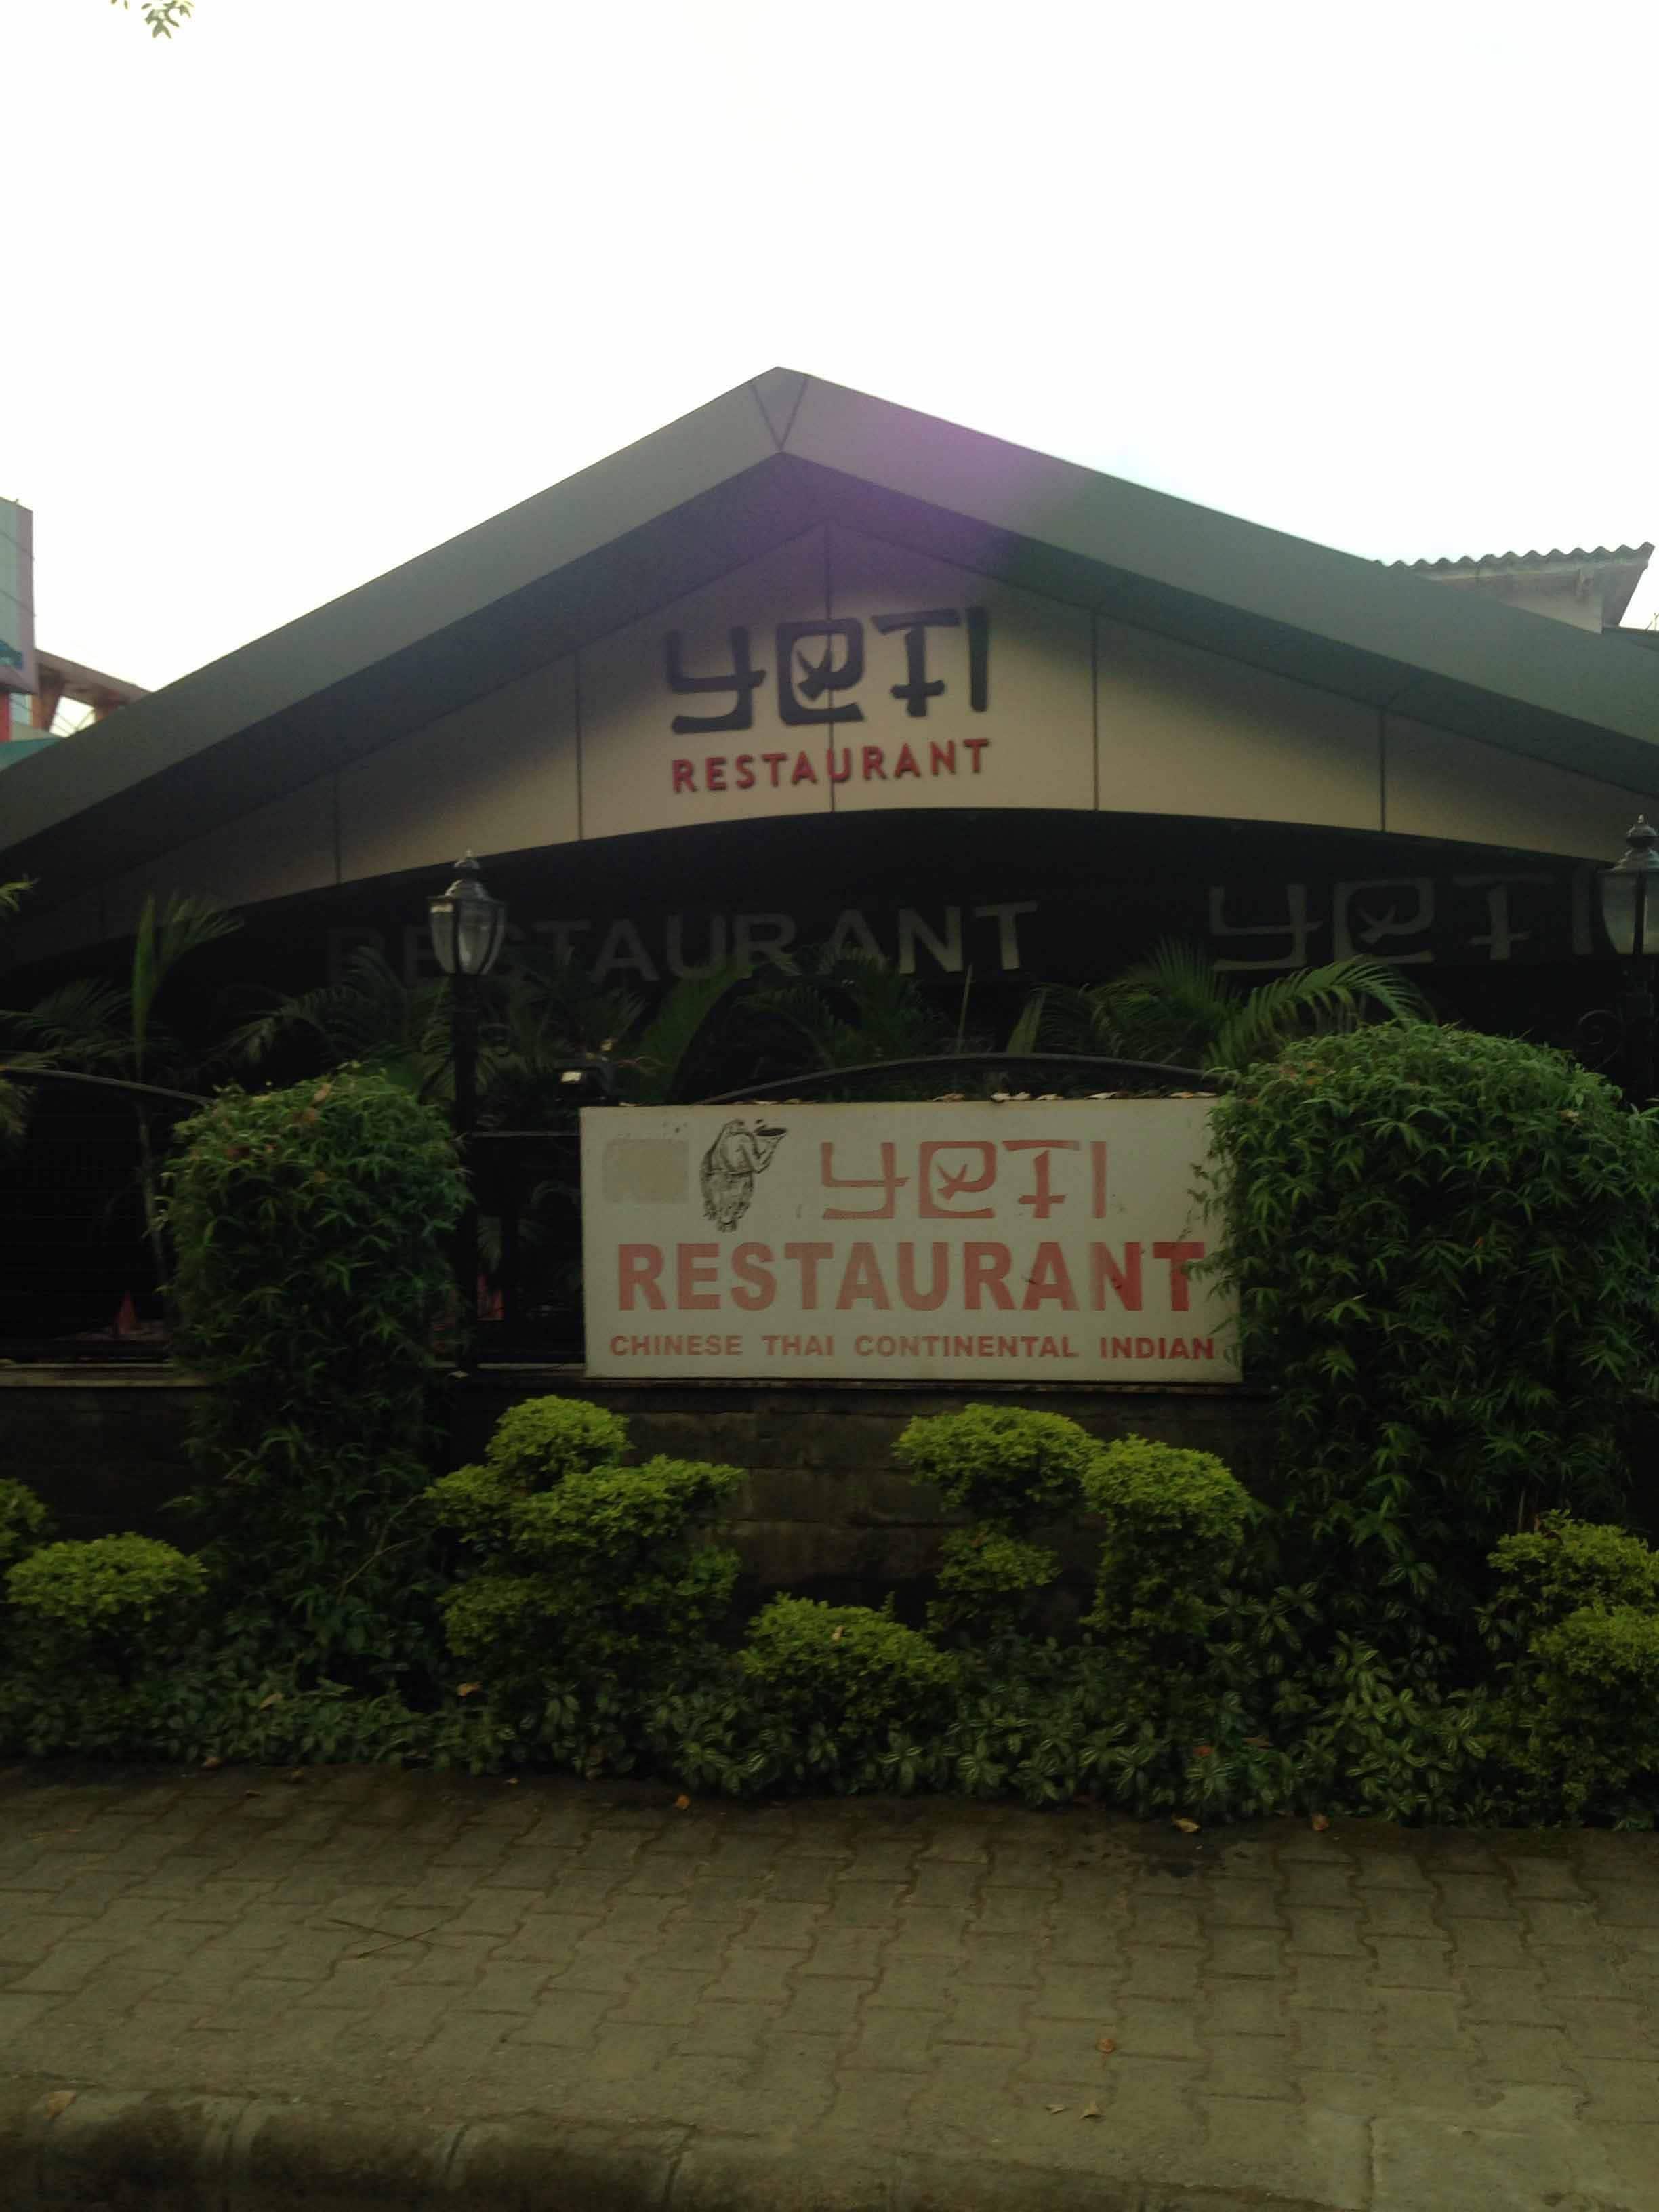 Yeti Restaurant - Dobhalwala - Dehradun Image